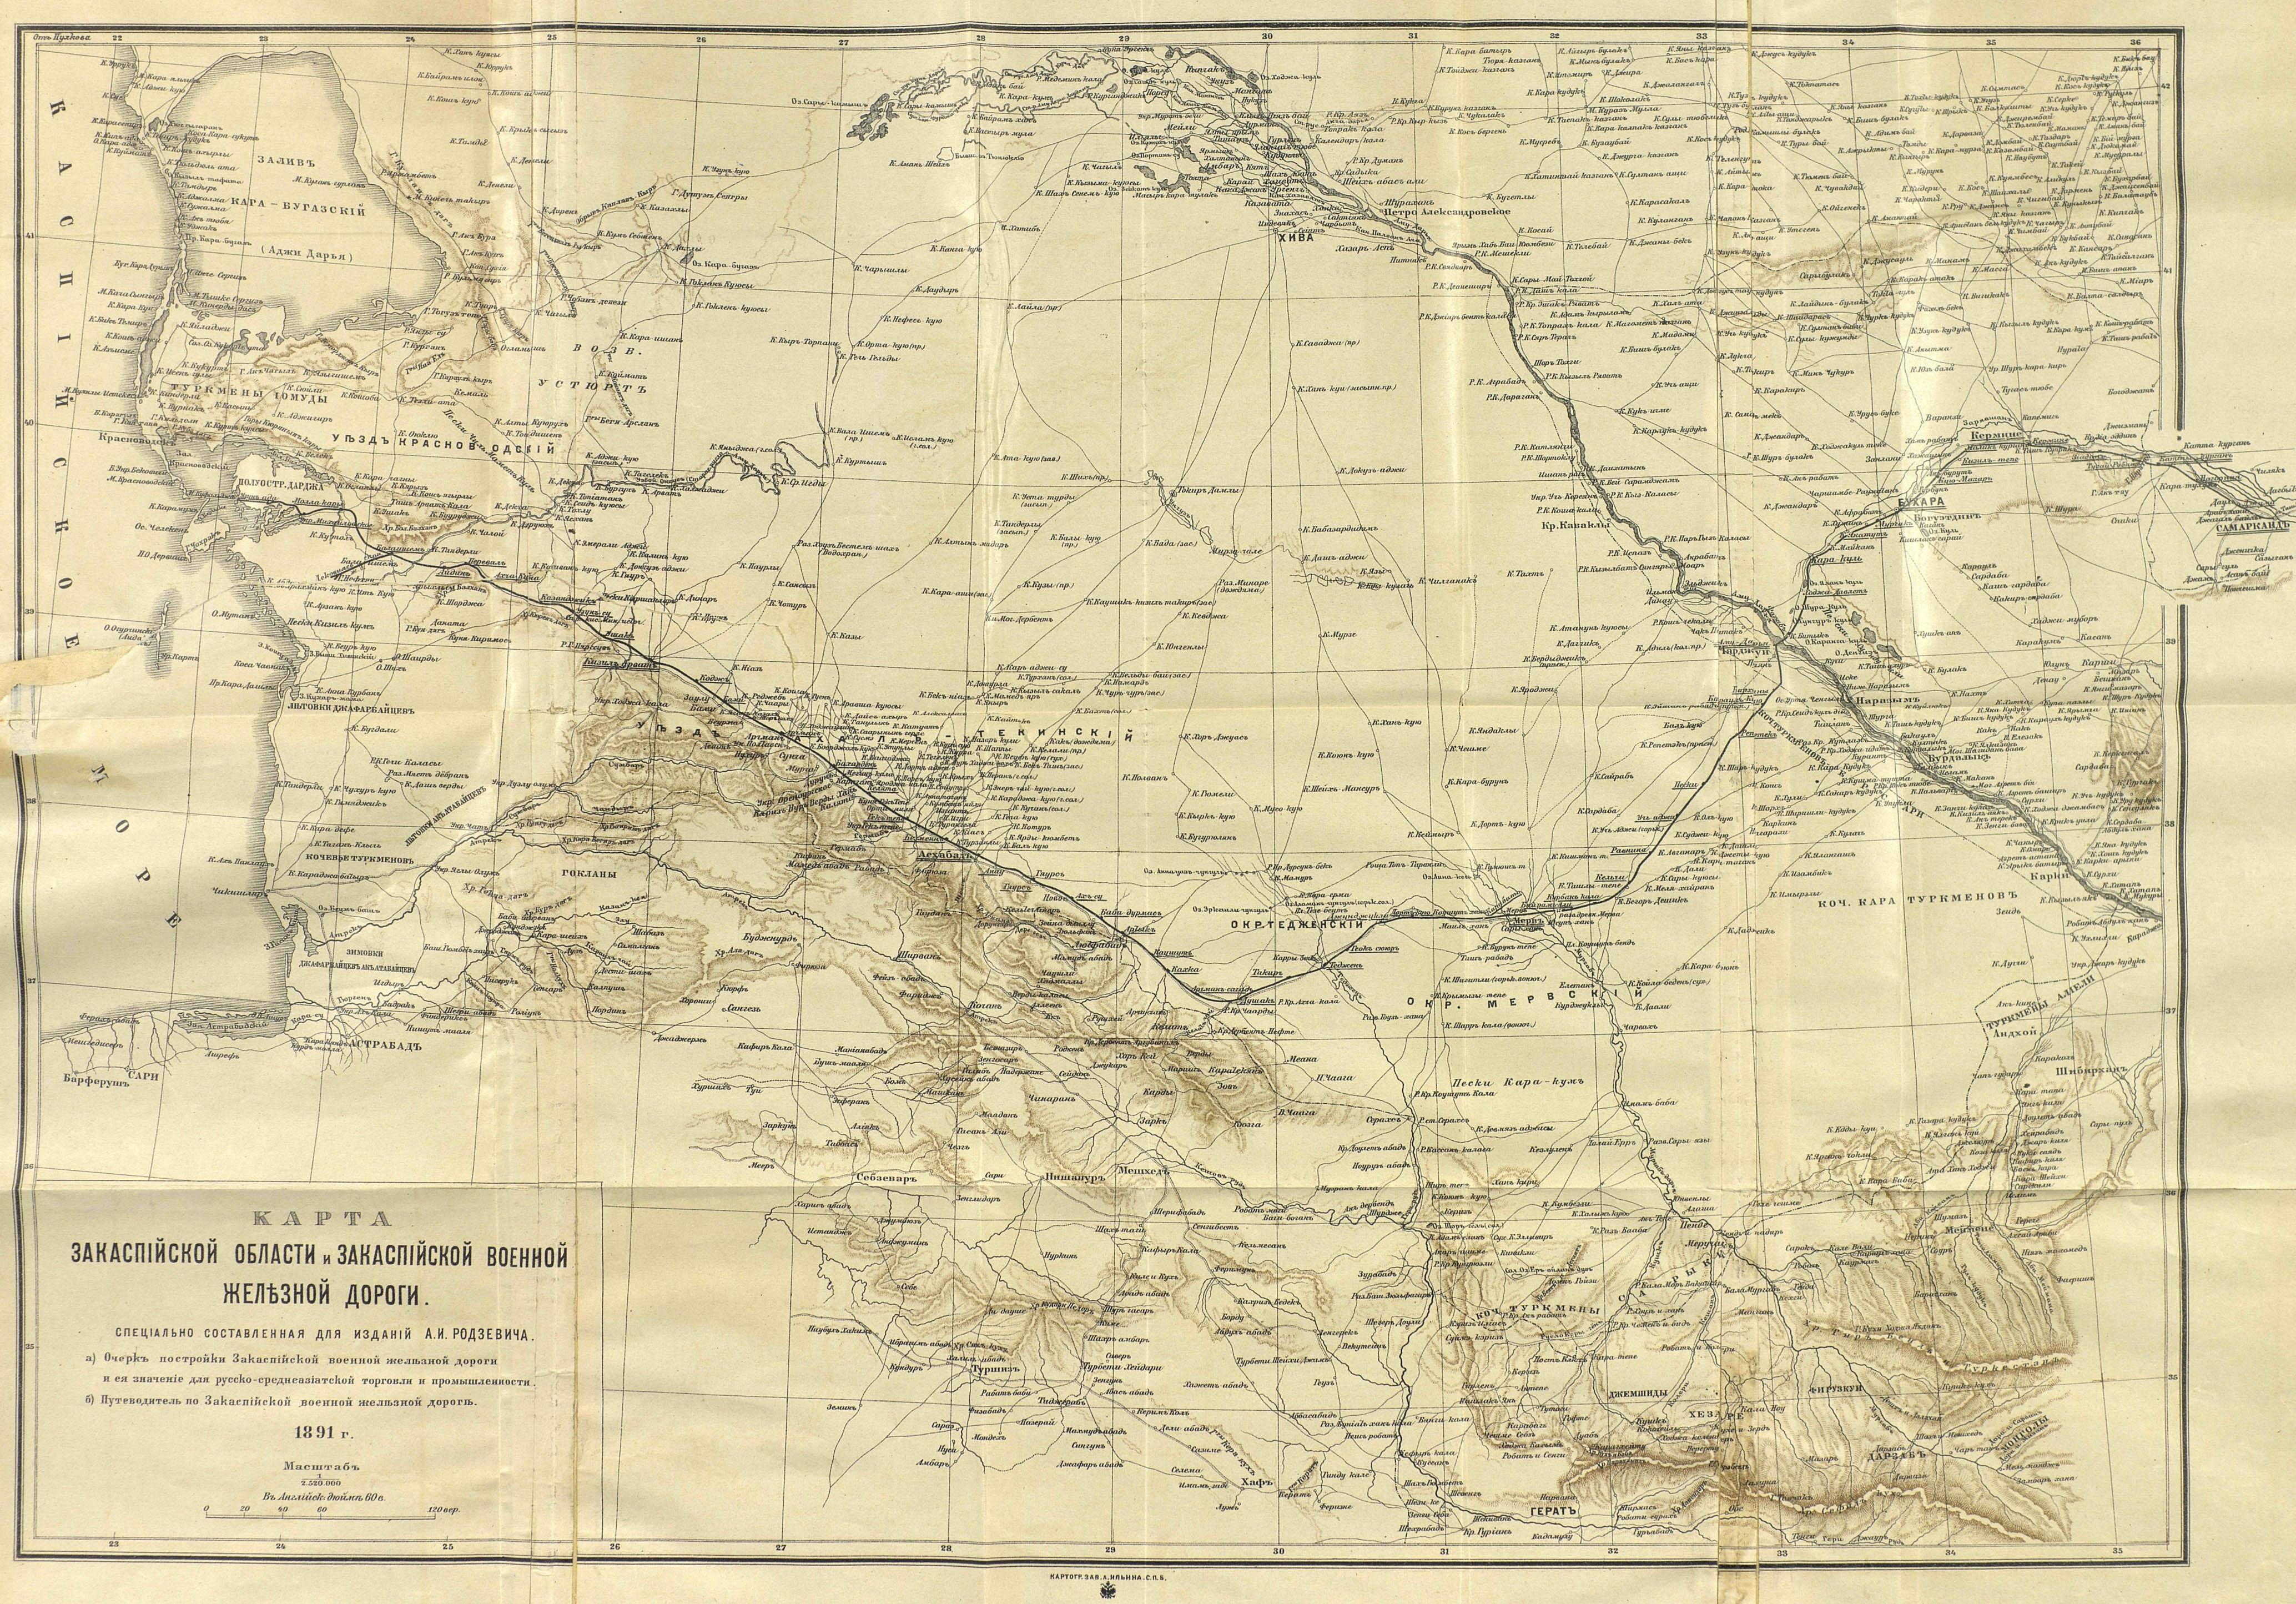 железные дороги туркмении схема